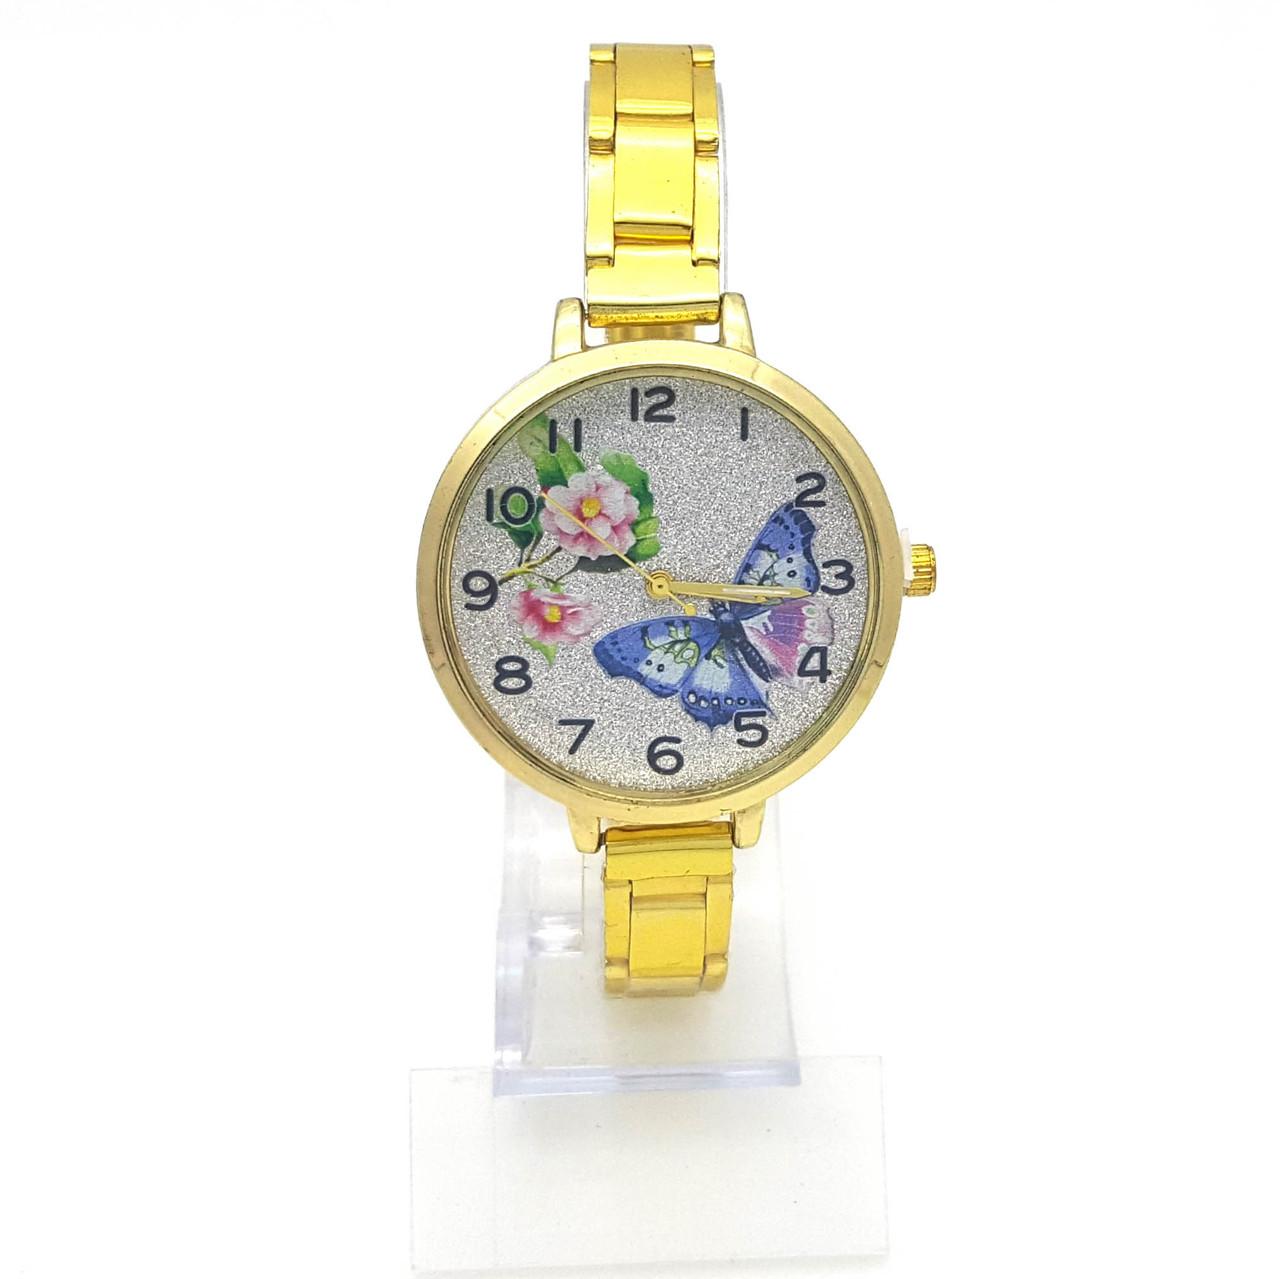 Часы на золотистом браслете с блестками, с Бабочками, р.20, циферблат 36мм